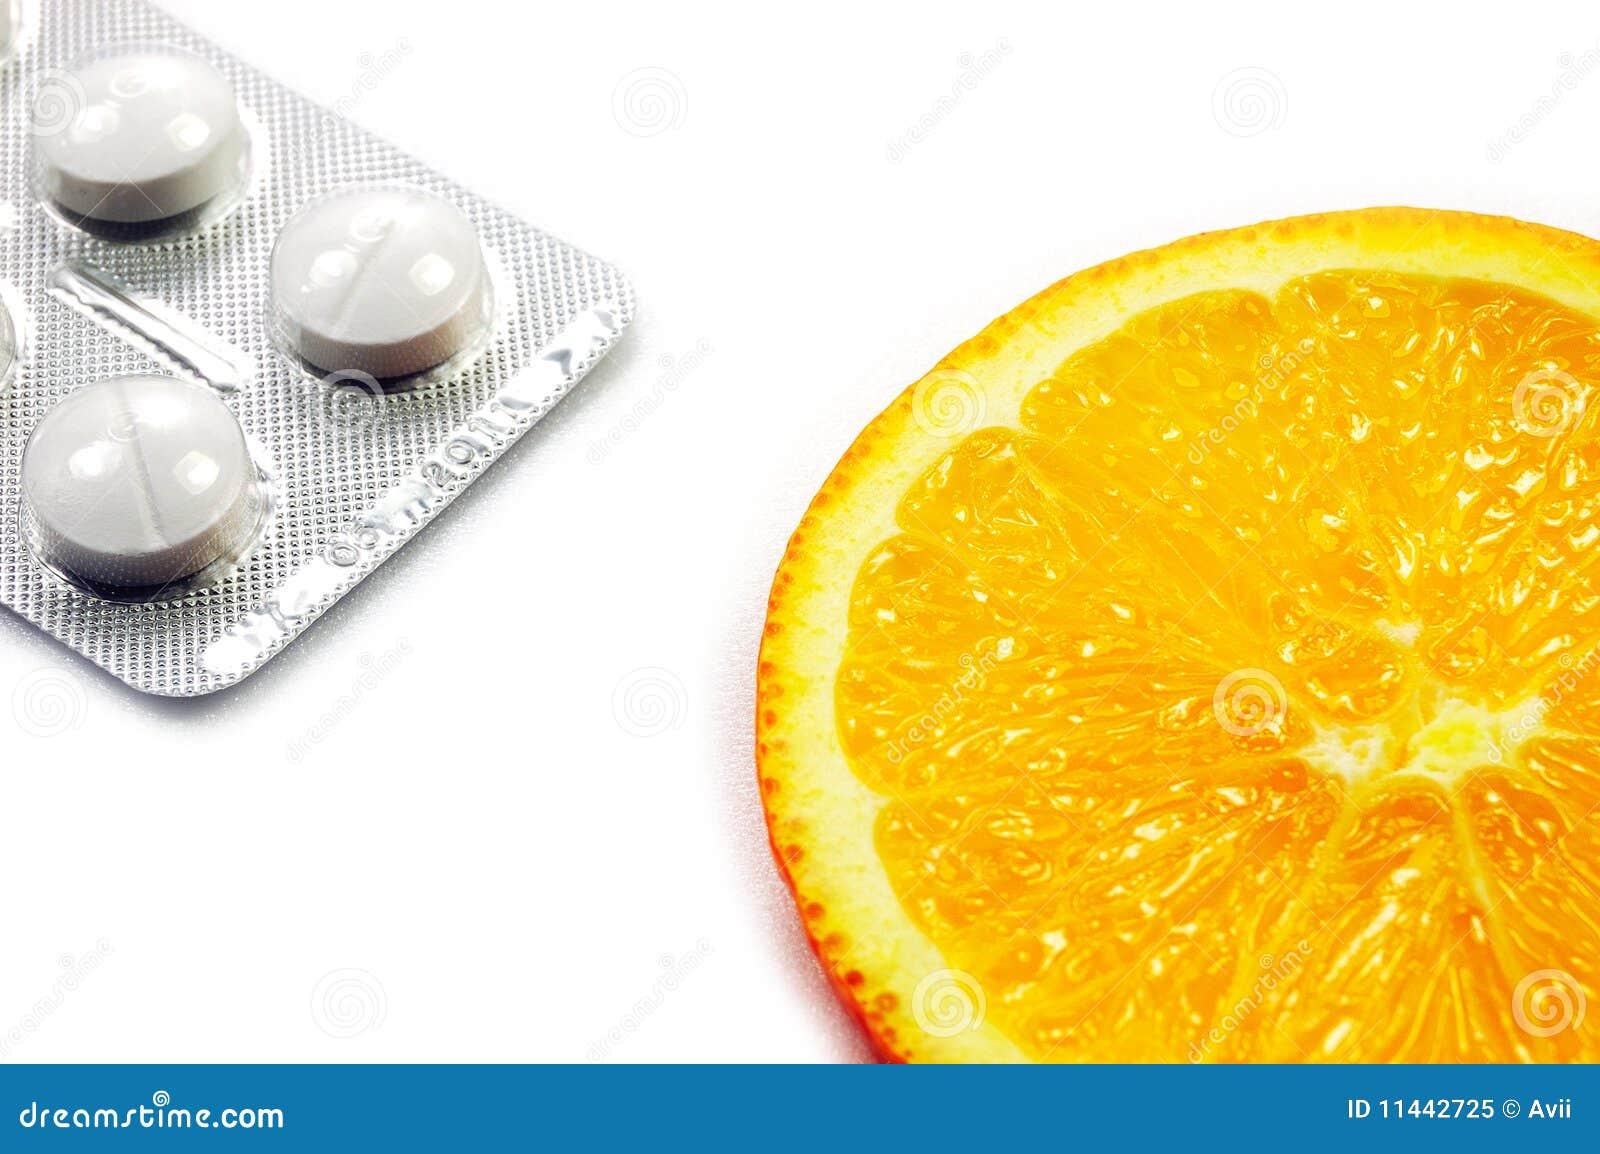 Natural Medicine Vs Pharmaceutical